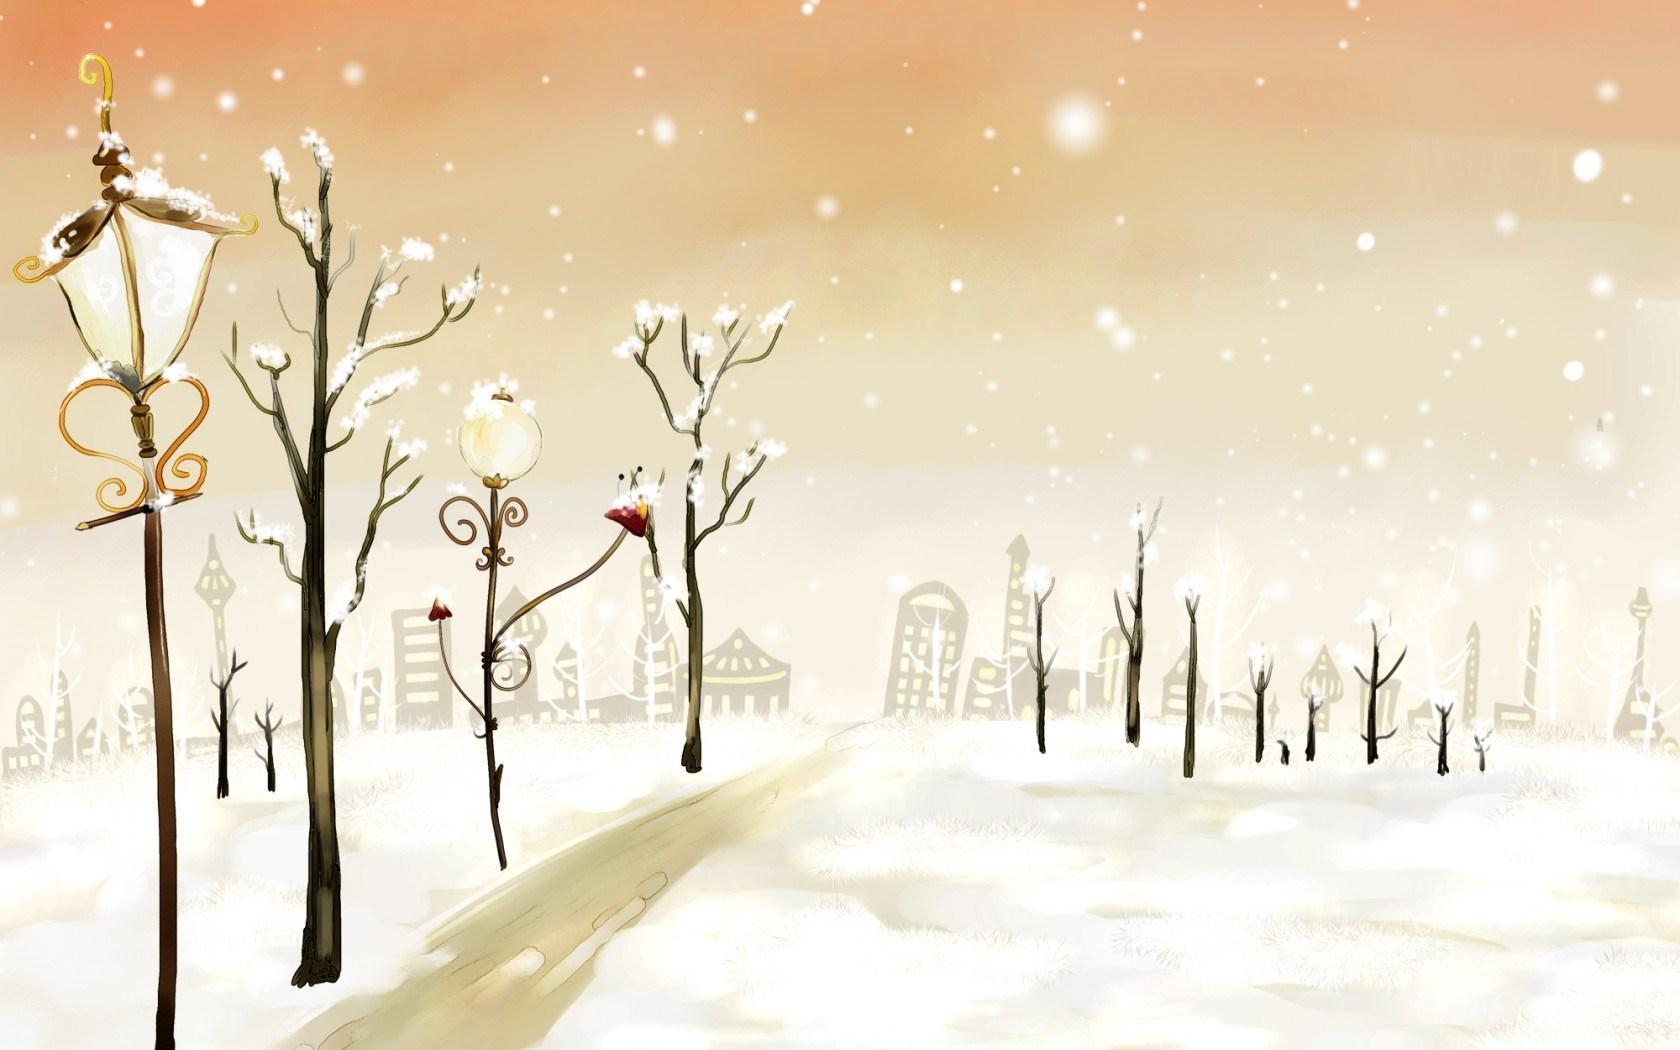 Drawn wallpaper winter Snow Drawing Winter 1680x1050 Snow